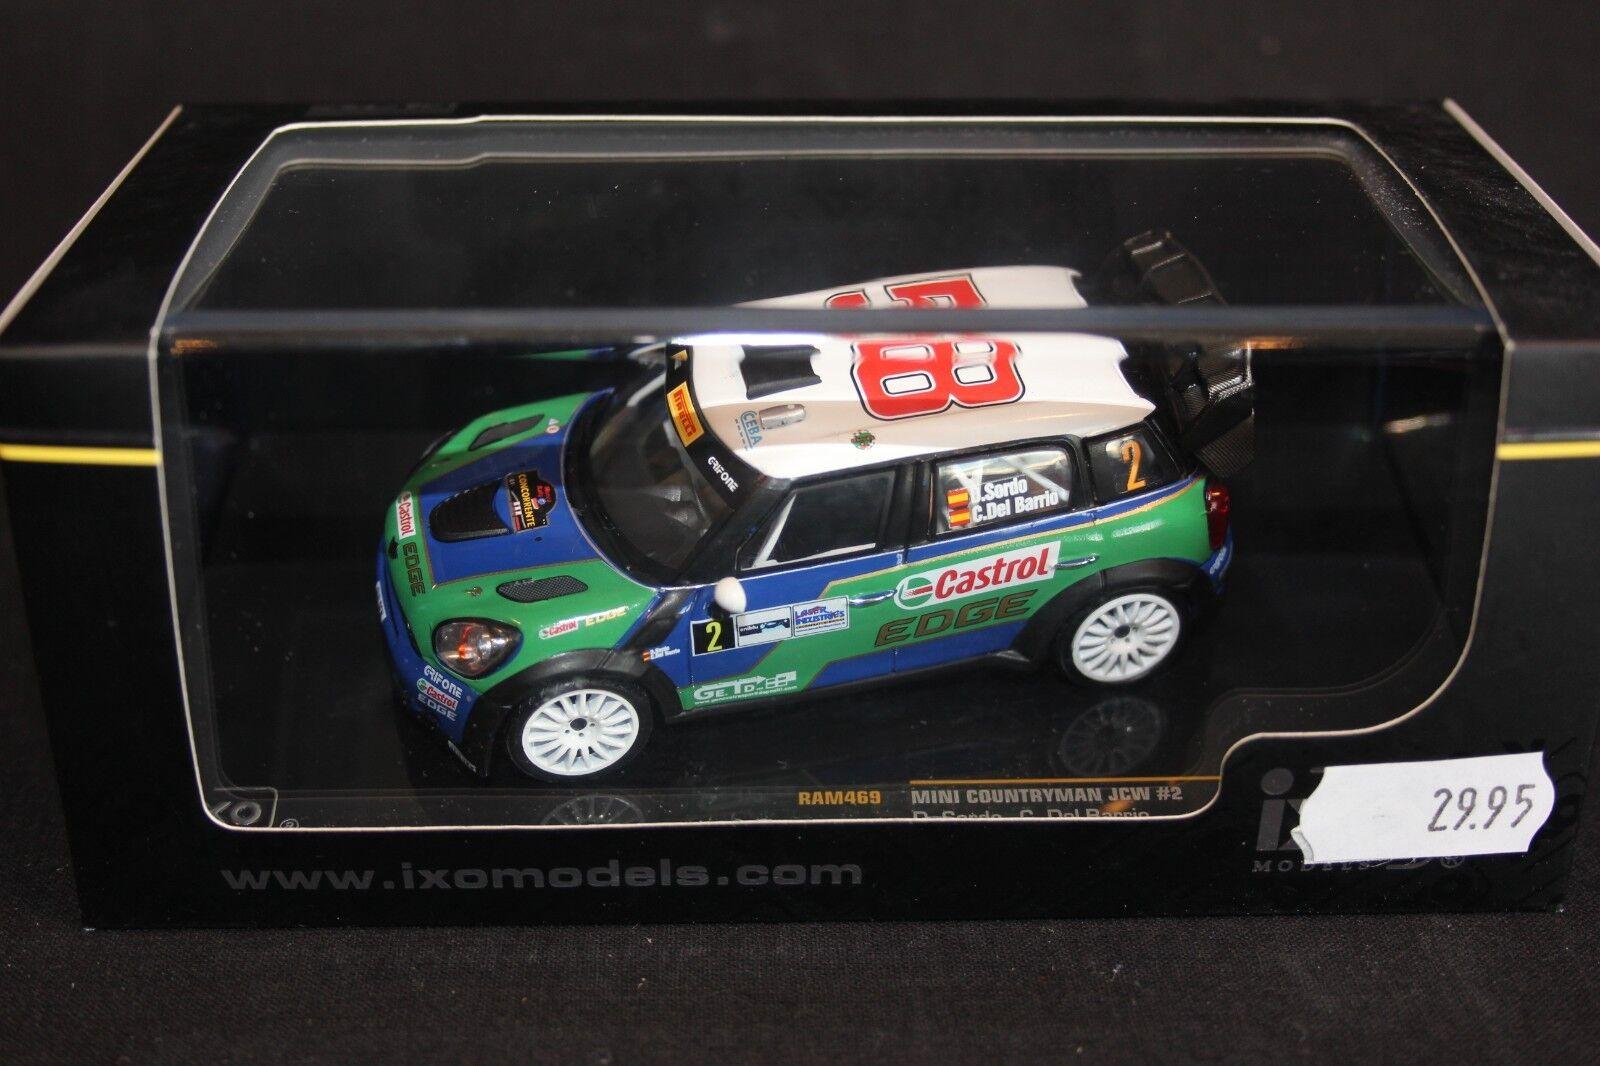 IXO Mini Countryman JCW 2011 1 43 43 43 Sordo   Del Barrio Monza Rally Show eed8b9